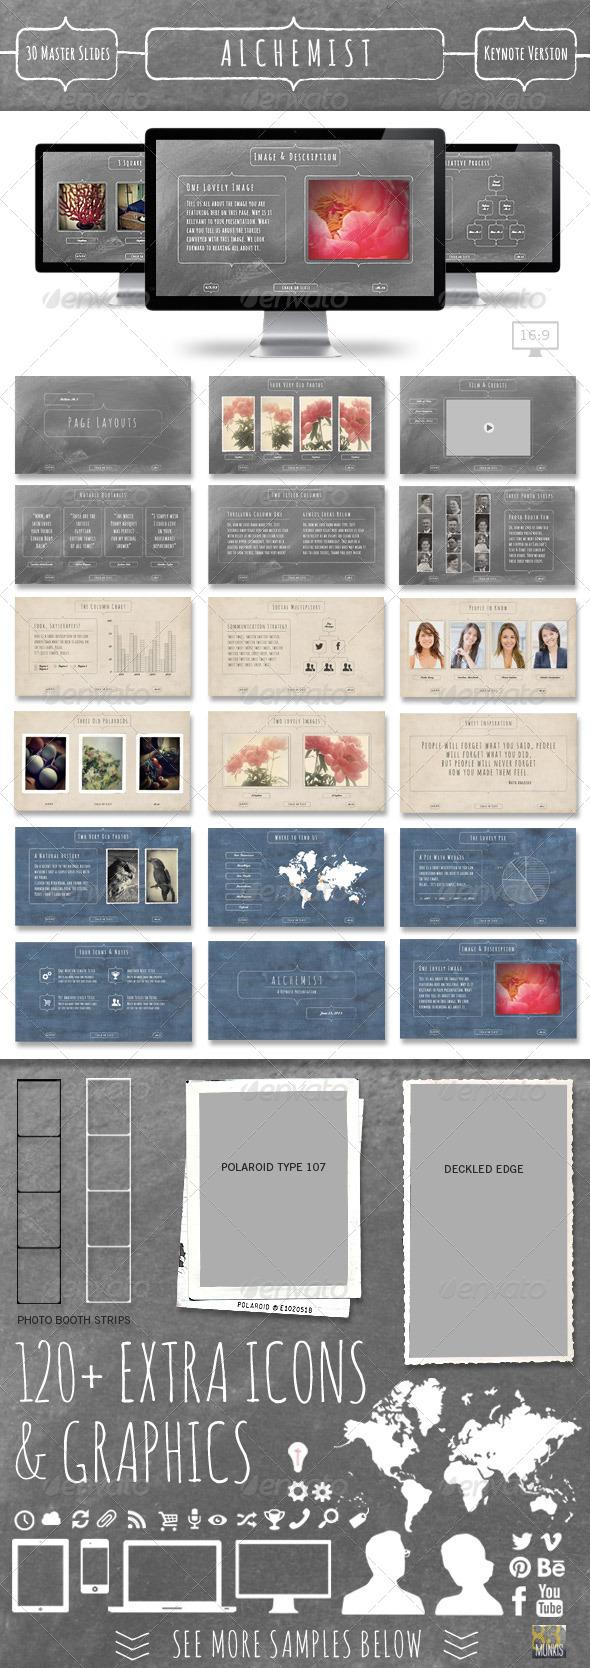 GraphicRiver Alchemist Keynote Presentation Template 5042742